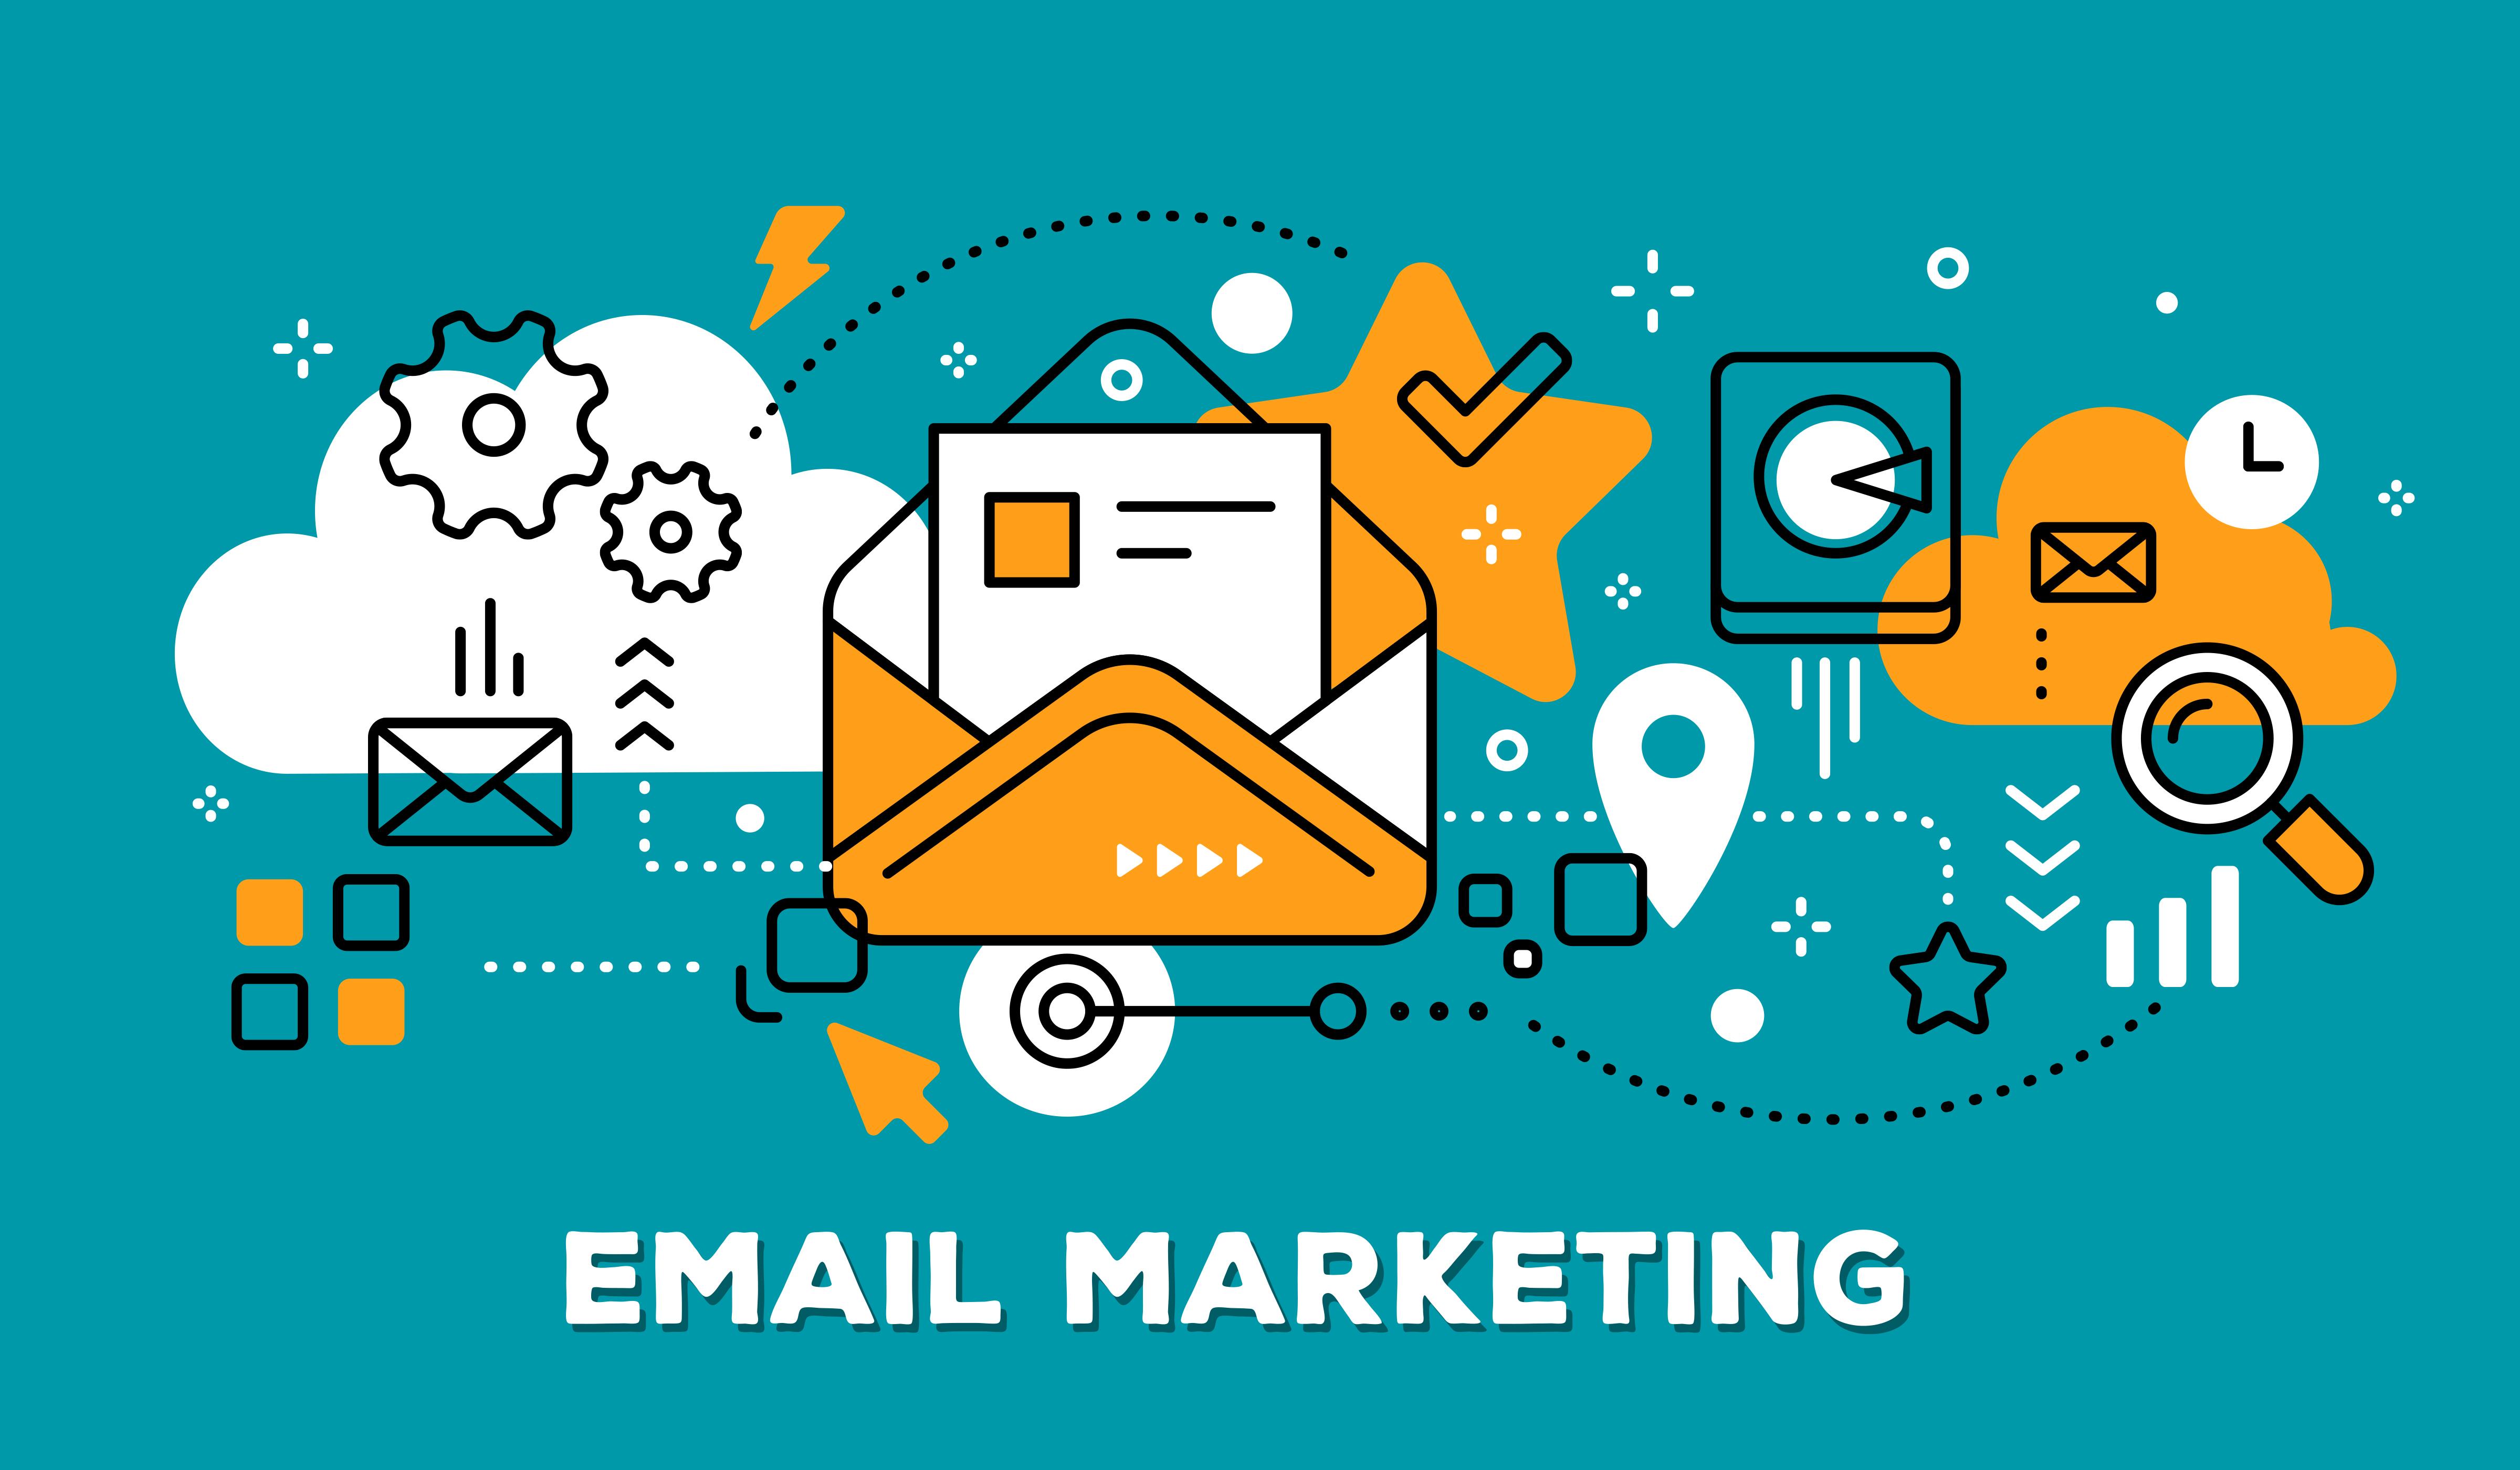 E-mail marketing - Definition